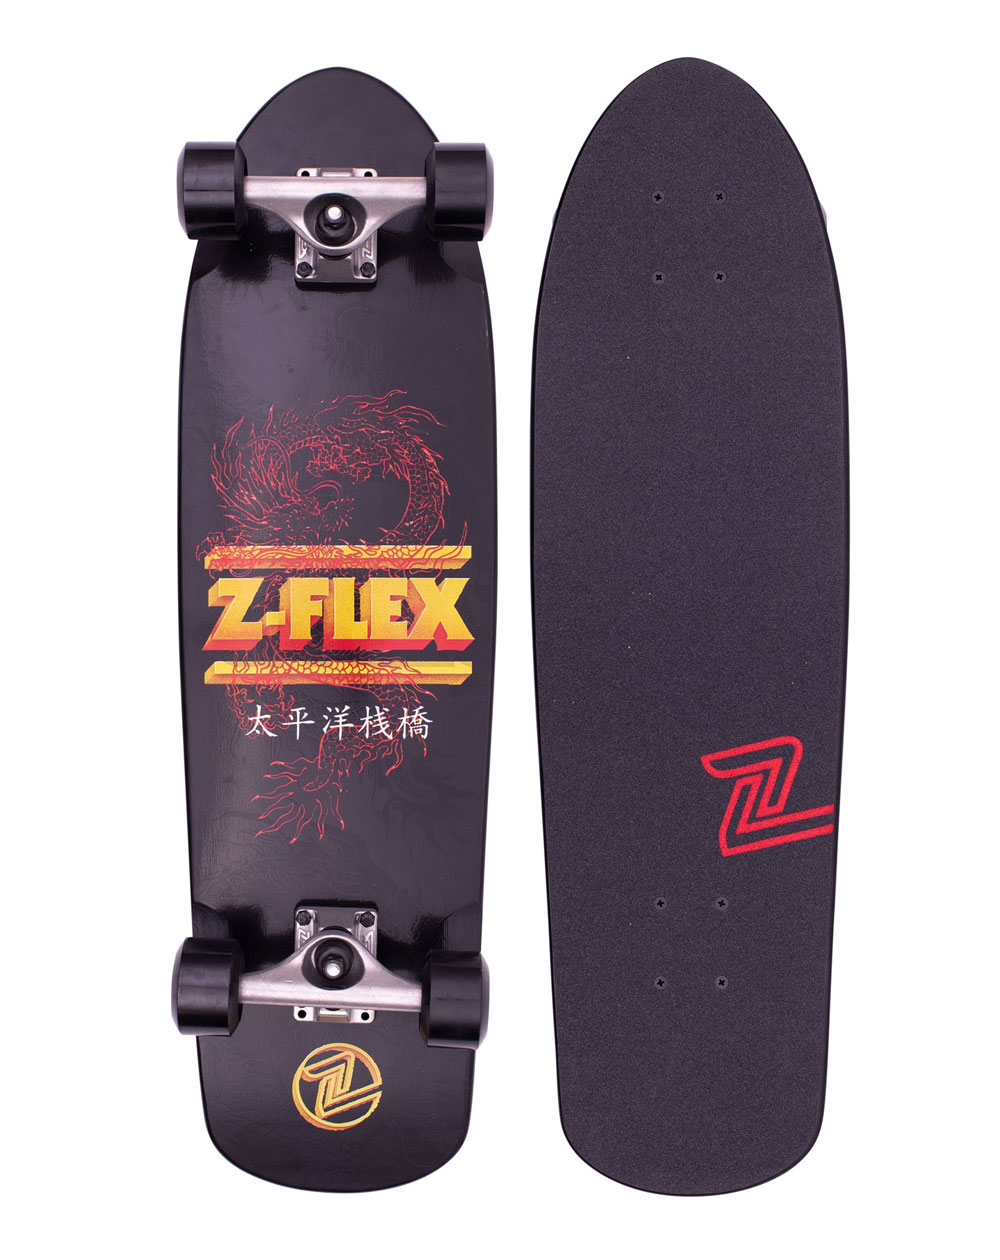 Z-Flex Skate Cruiser Dragon Shorebreak Black